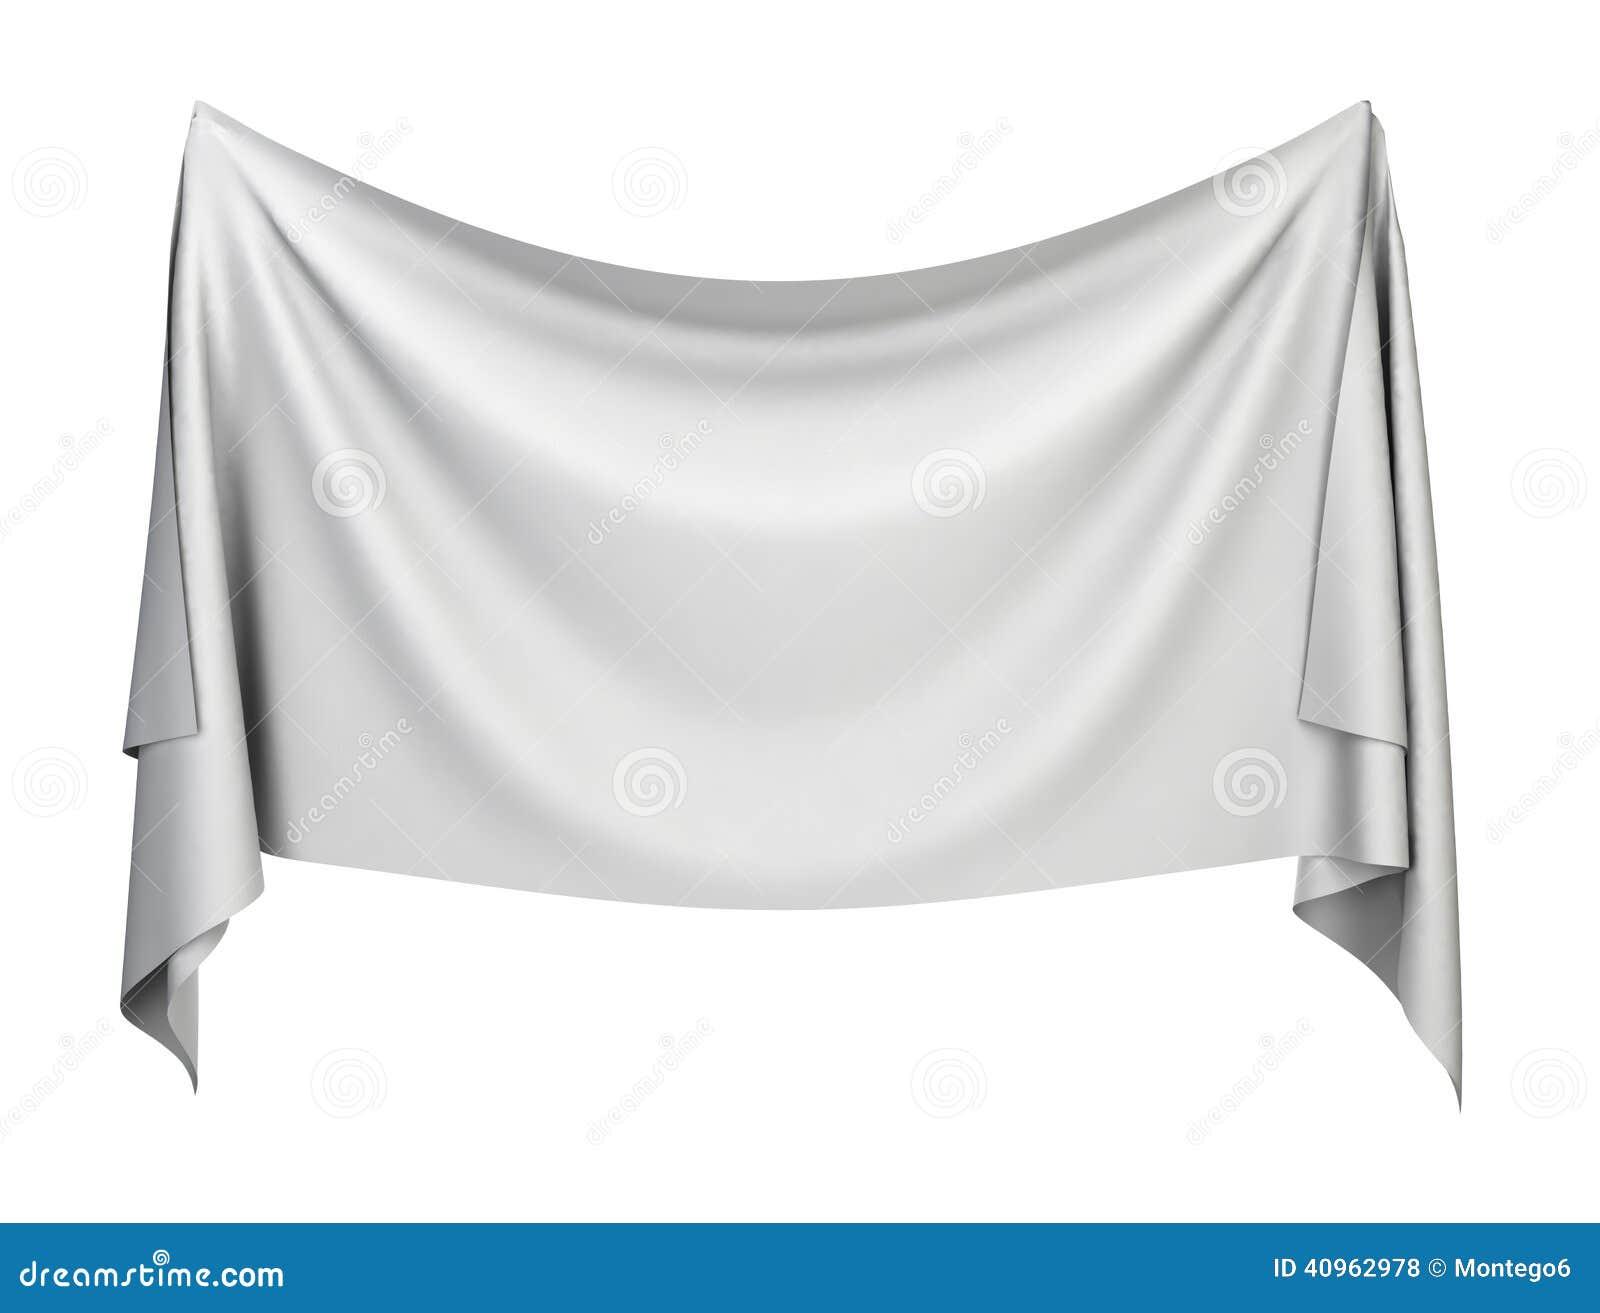 cloth banner stock illustration image 40962978